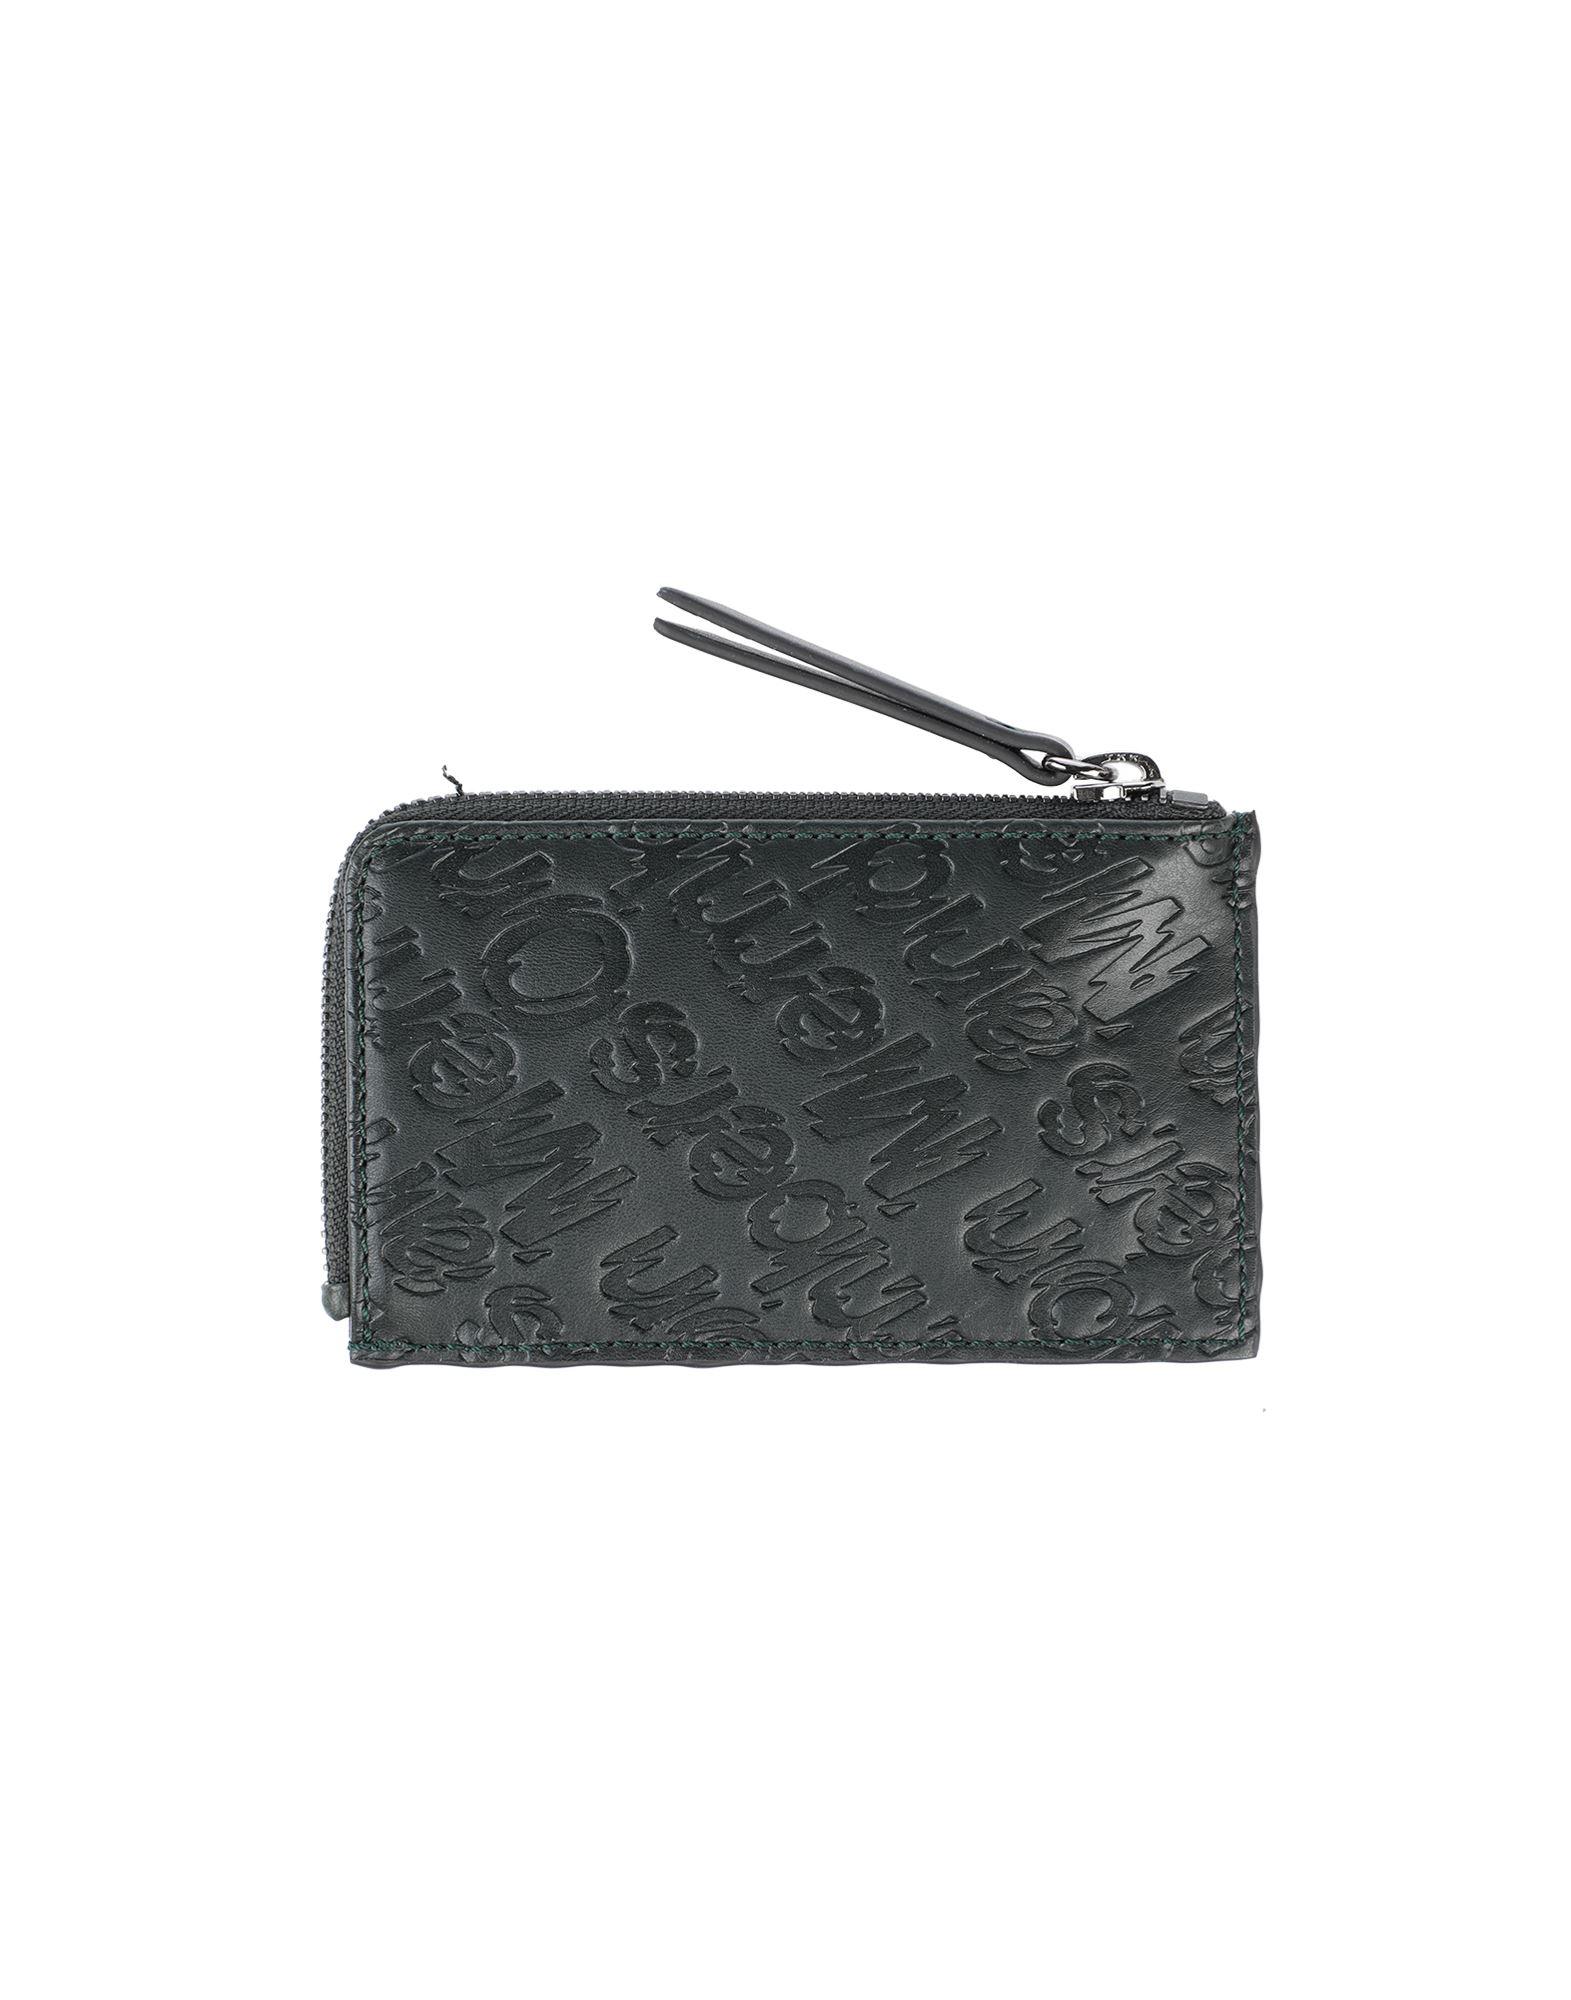 STELLA McCARTNEY Coin purses - Item 46727357